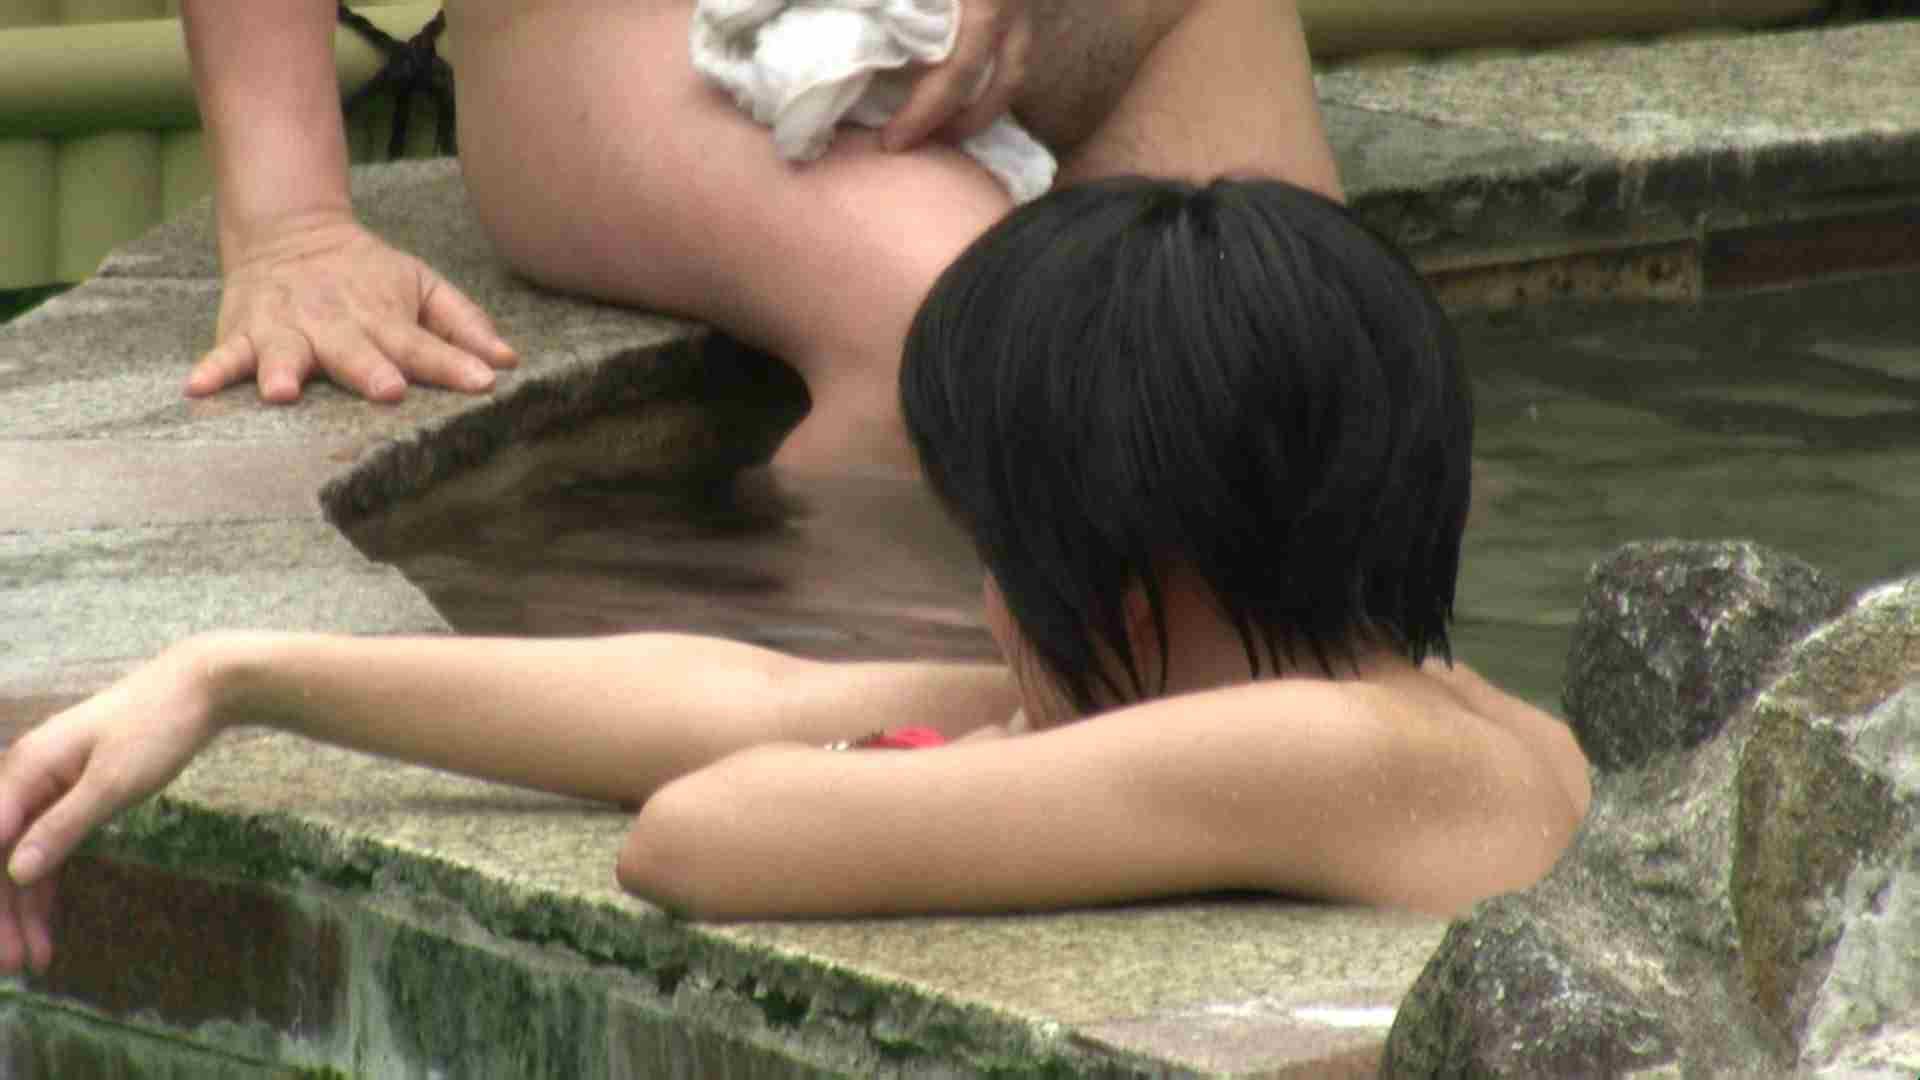 Aquaな露天風呂Vol.37【VIP】 盗撮 濡れ場動画紹介 97PICs 65